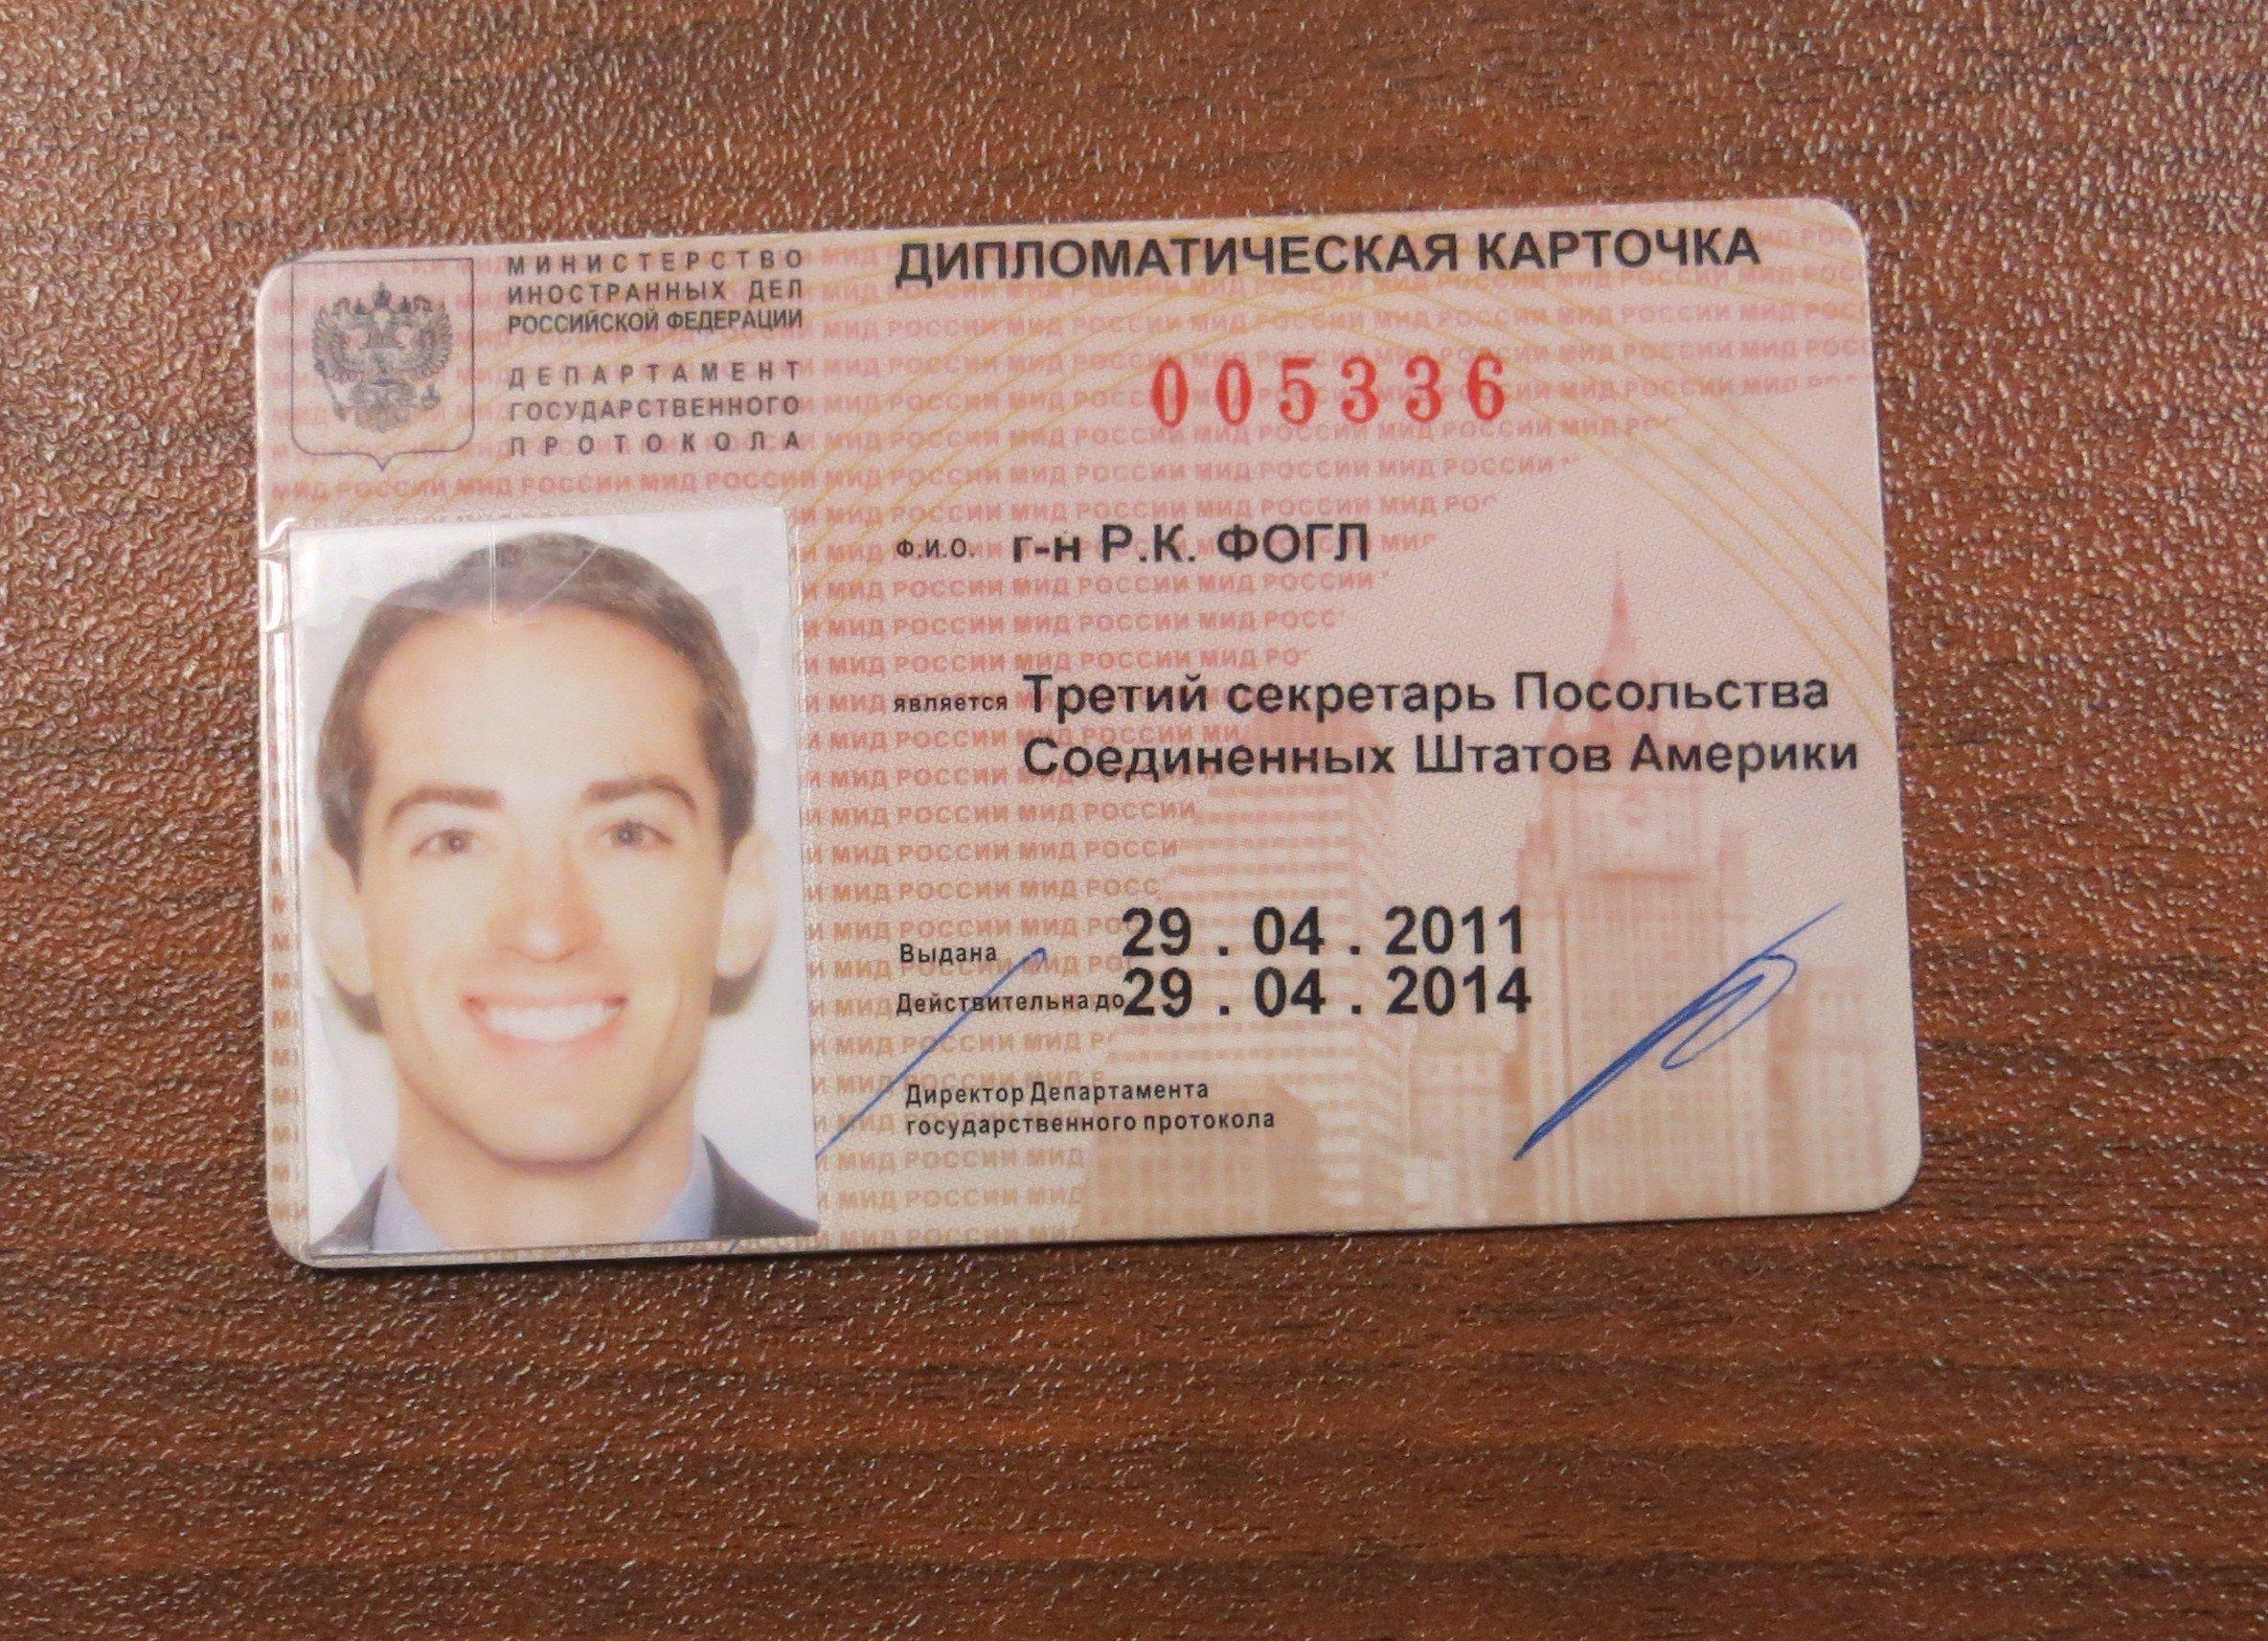 Ryan Christopher Fogle's ID